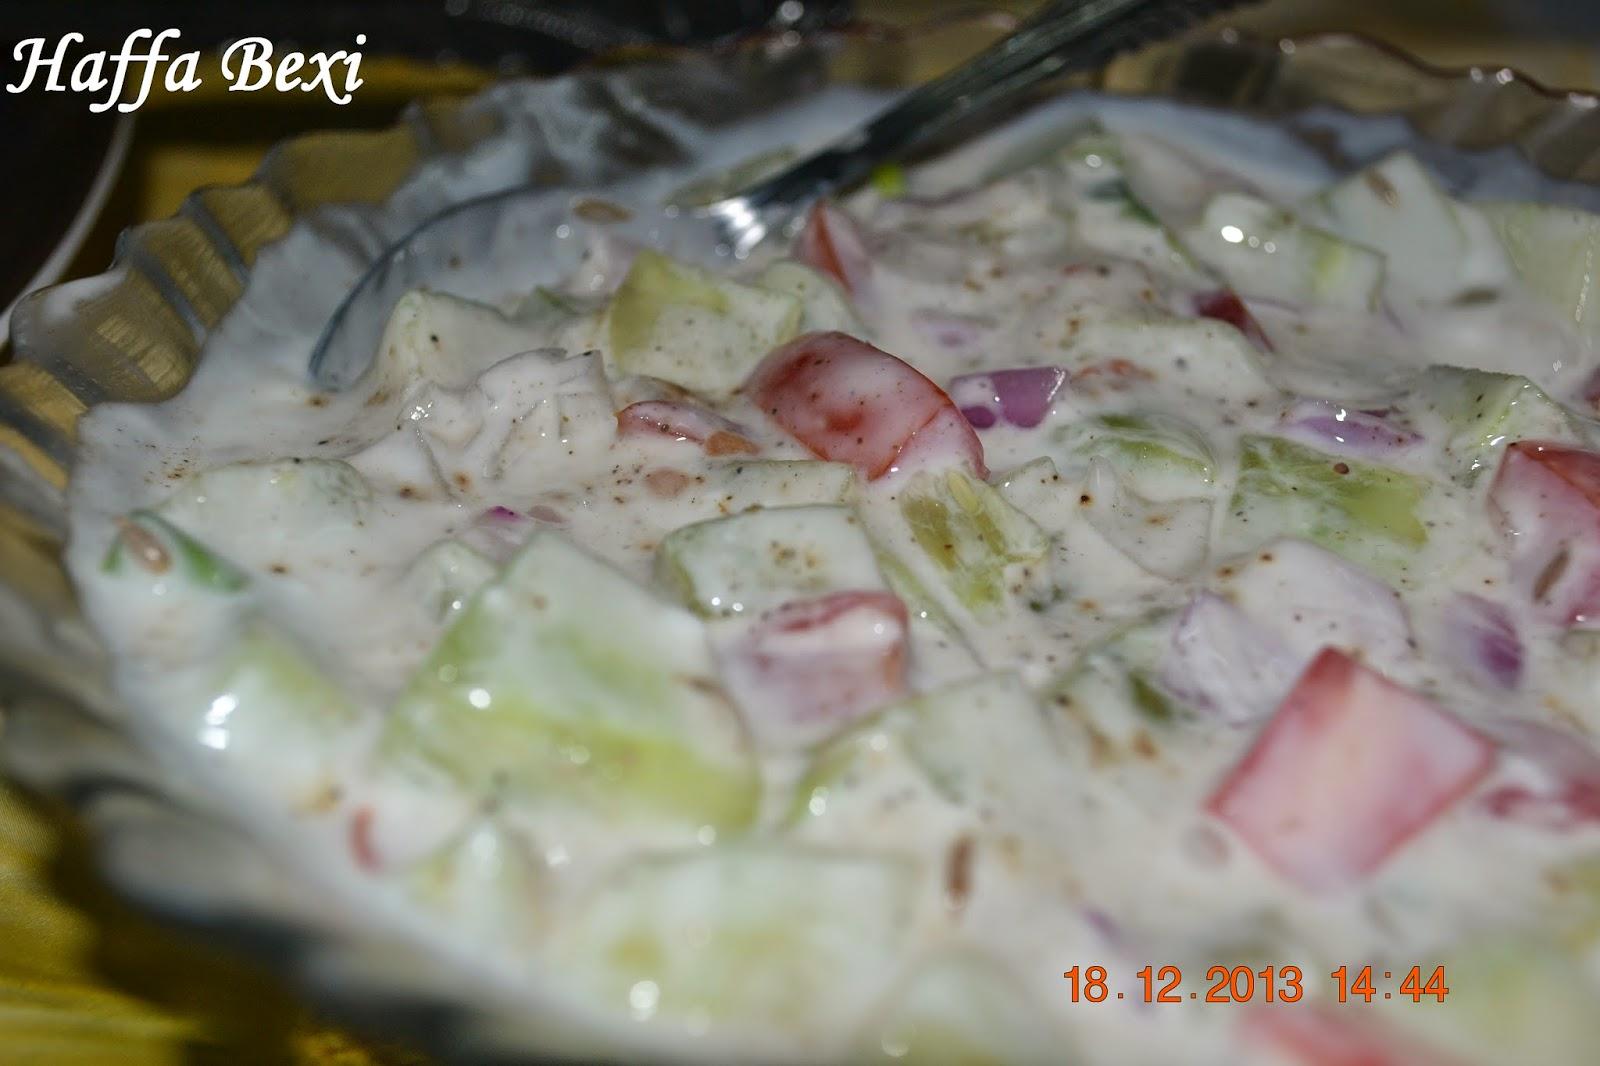 Diet recipes, salad mixed with yoghurt dip, salads, Sauces & Chutneys, weight loss recipes, Yoghurt dip, salad recipes, salads recipes, yogurt dip, yogurt salad dressing,